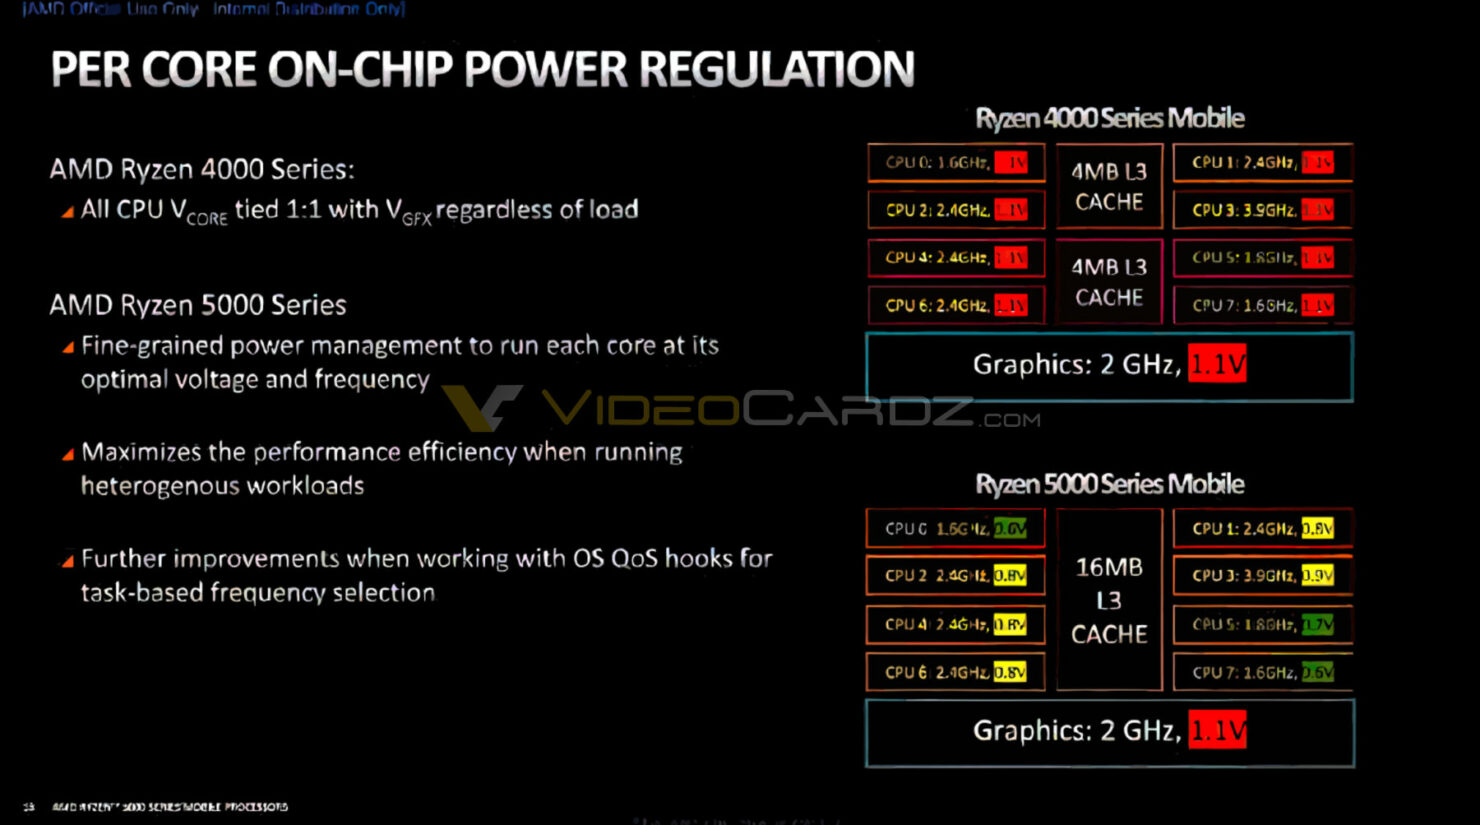 amd-ryzen-5000-per-core-on-chip-power-regulation